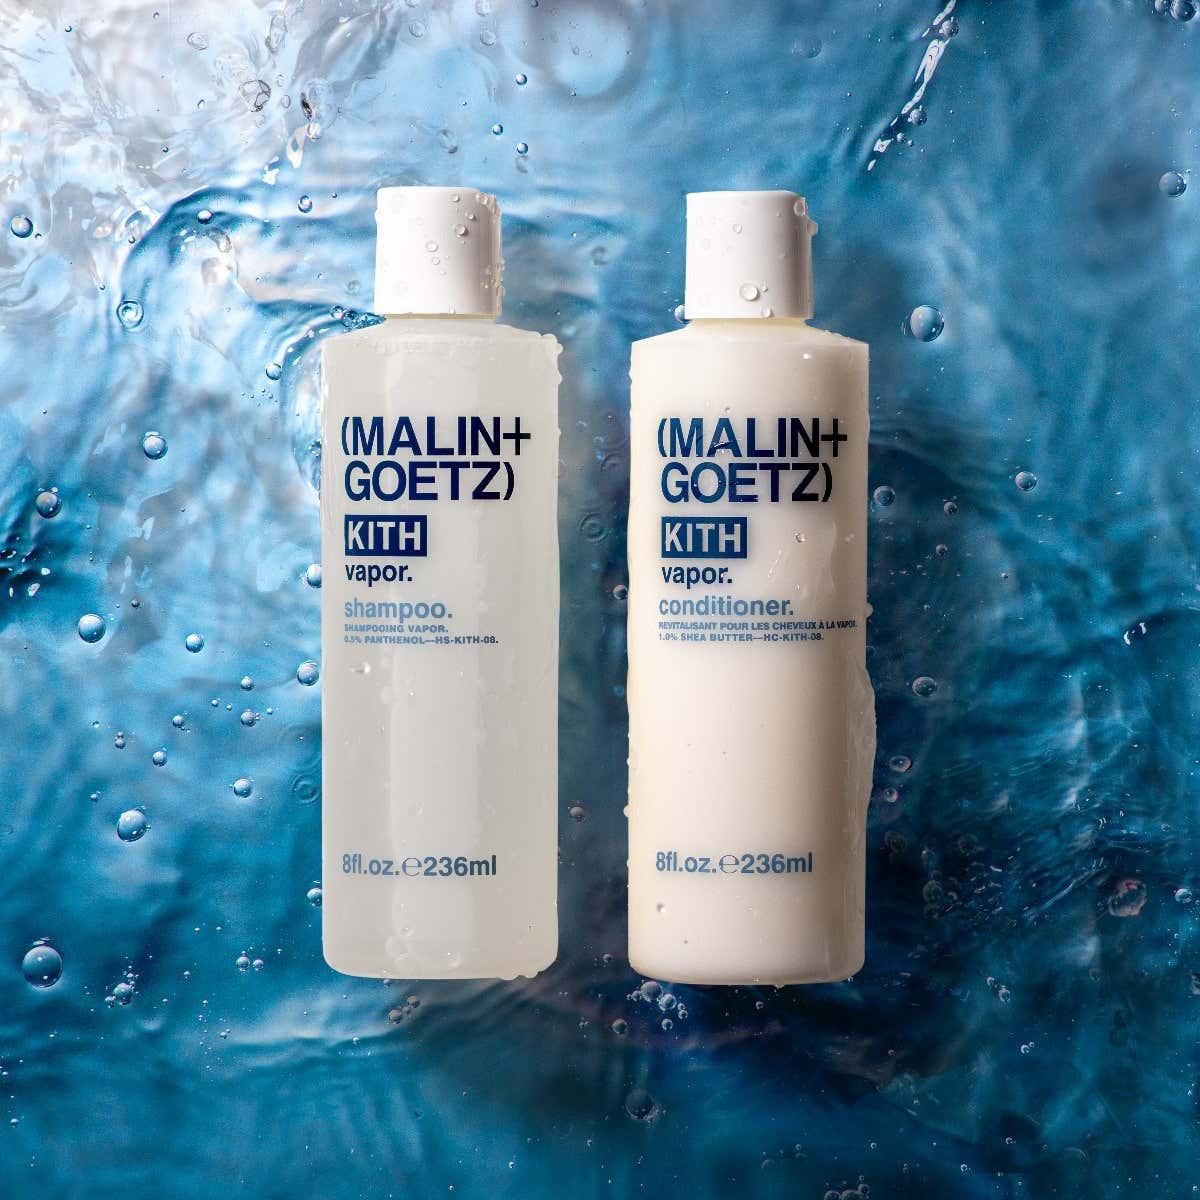 MALIN+GOETZ Kith shampoo and conditioner